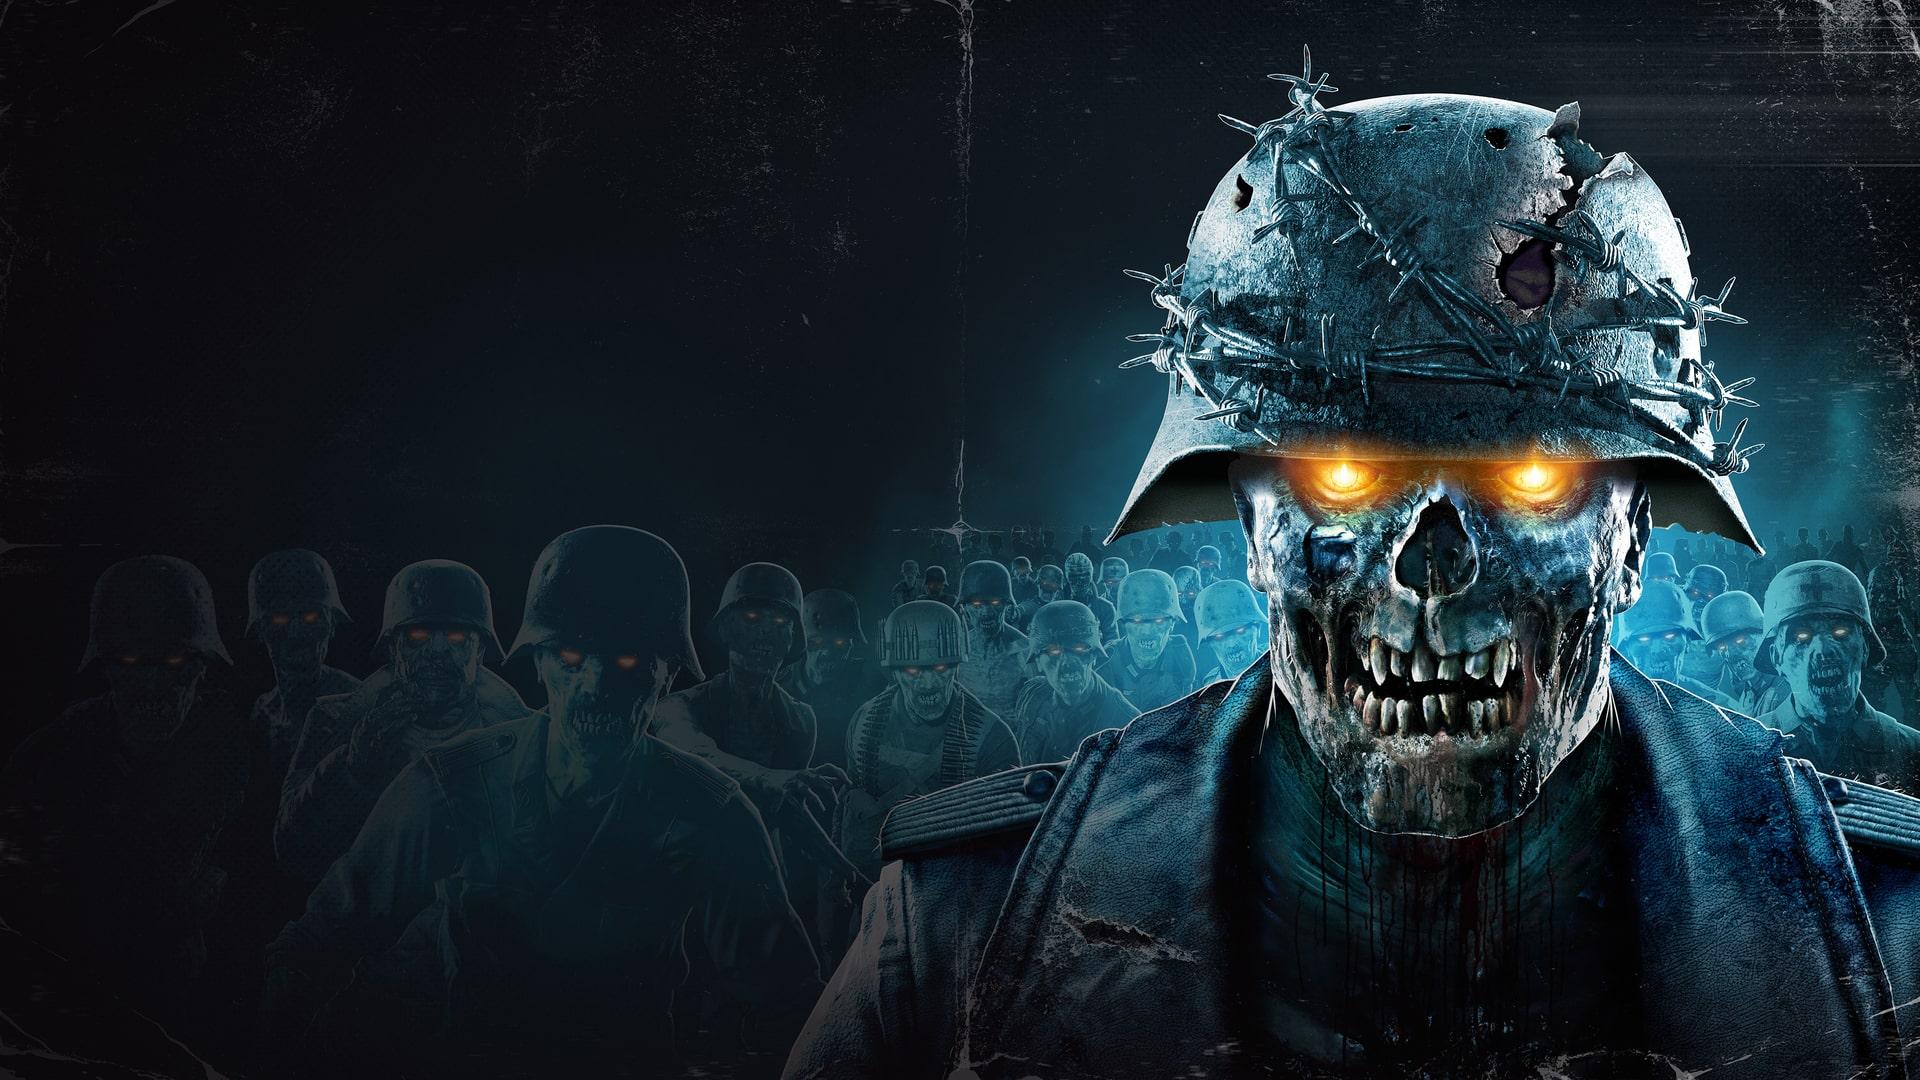 Zombie Army 4: Dead War (한국어판)